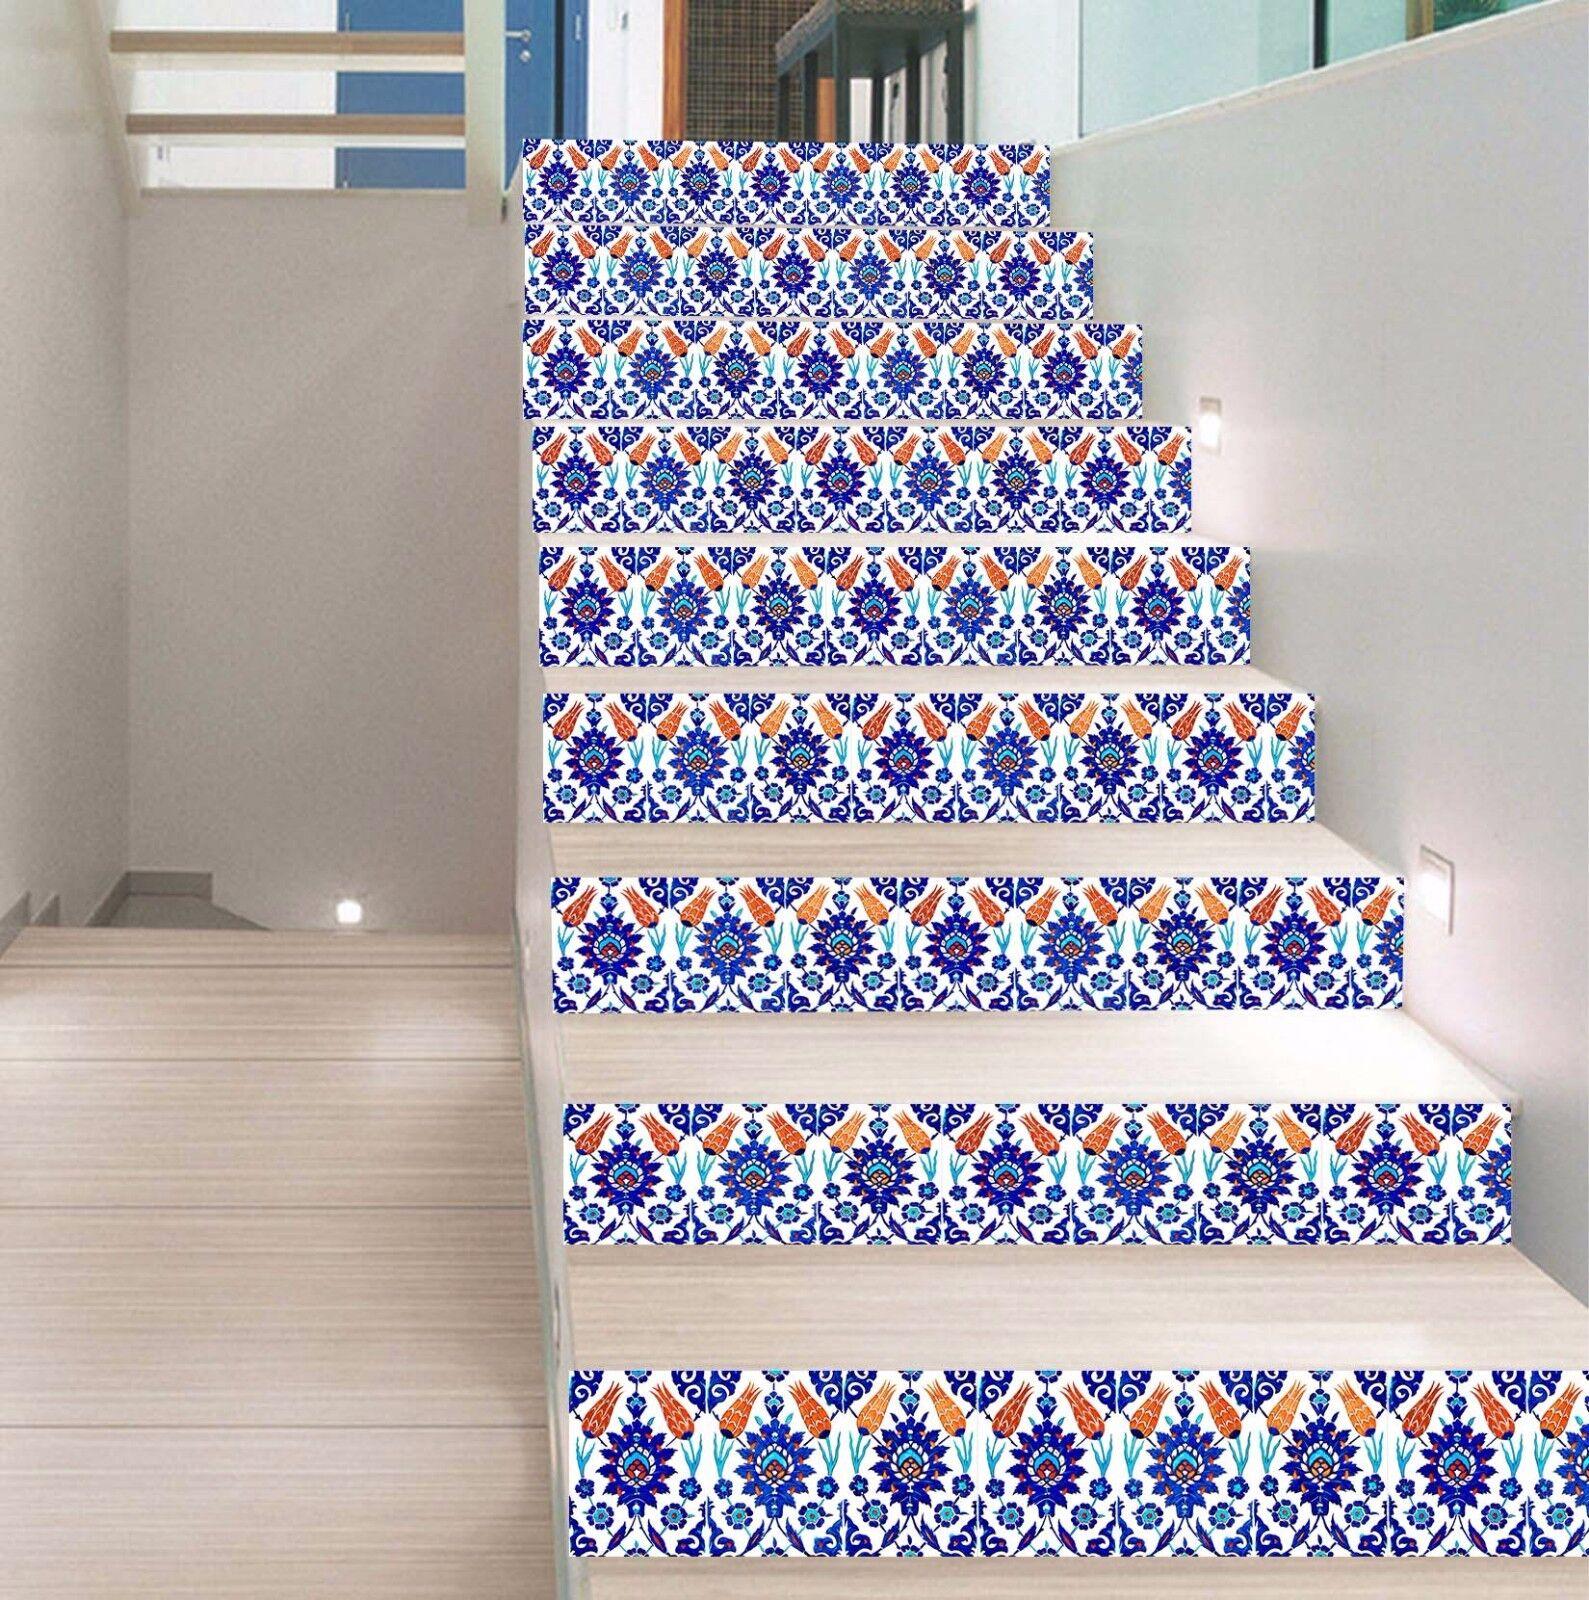 3D Pattern 633 Stair Riser Decoration Photo Mural Vinyl Decal Wallpaper UK Lemon